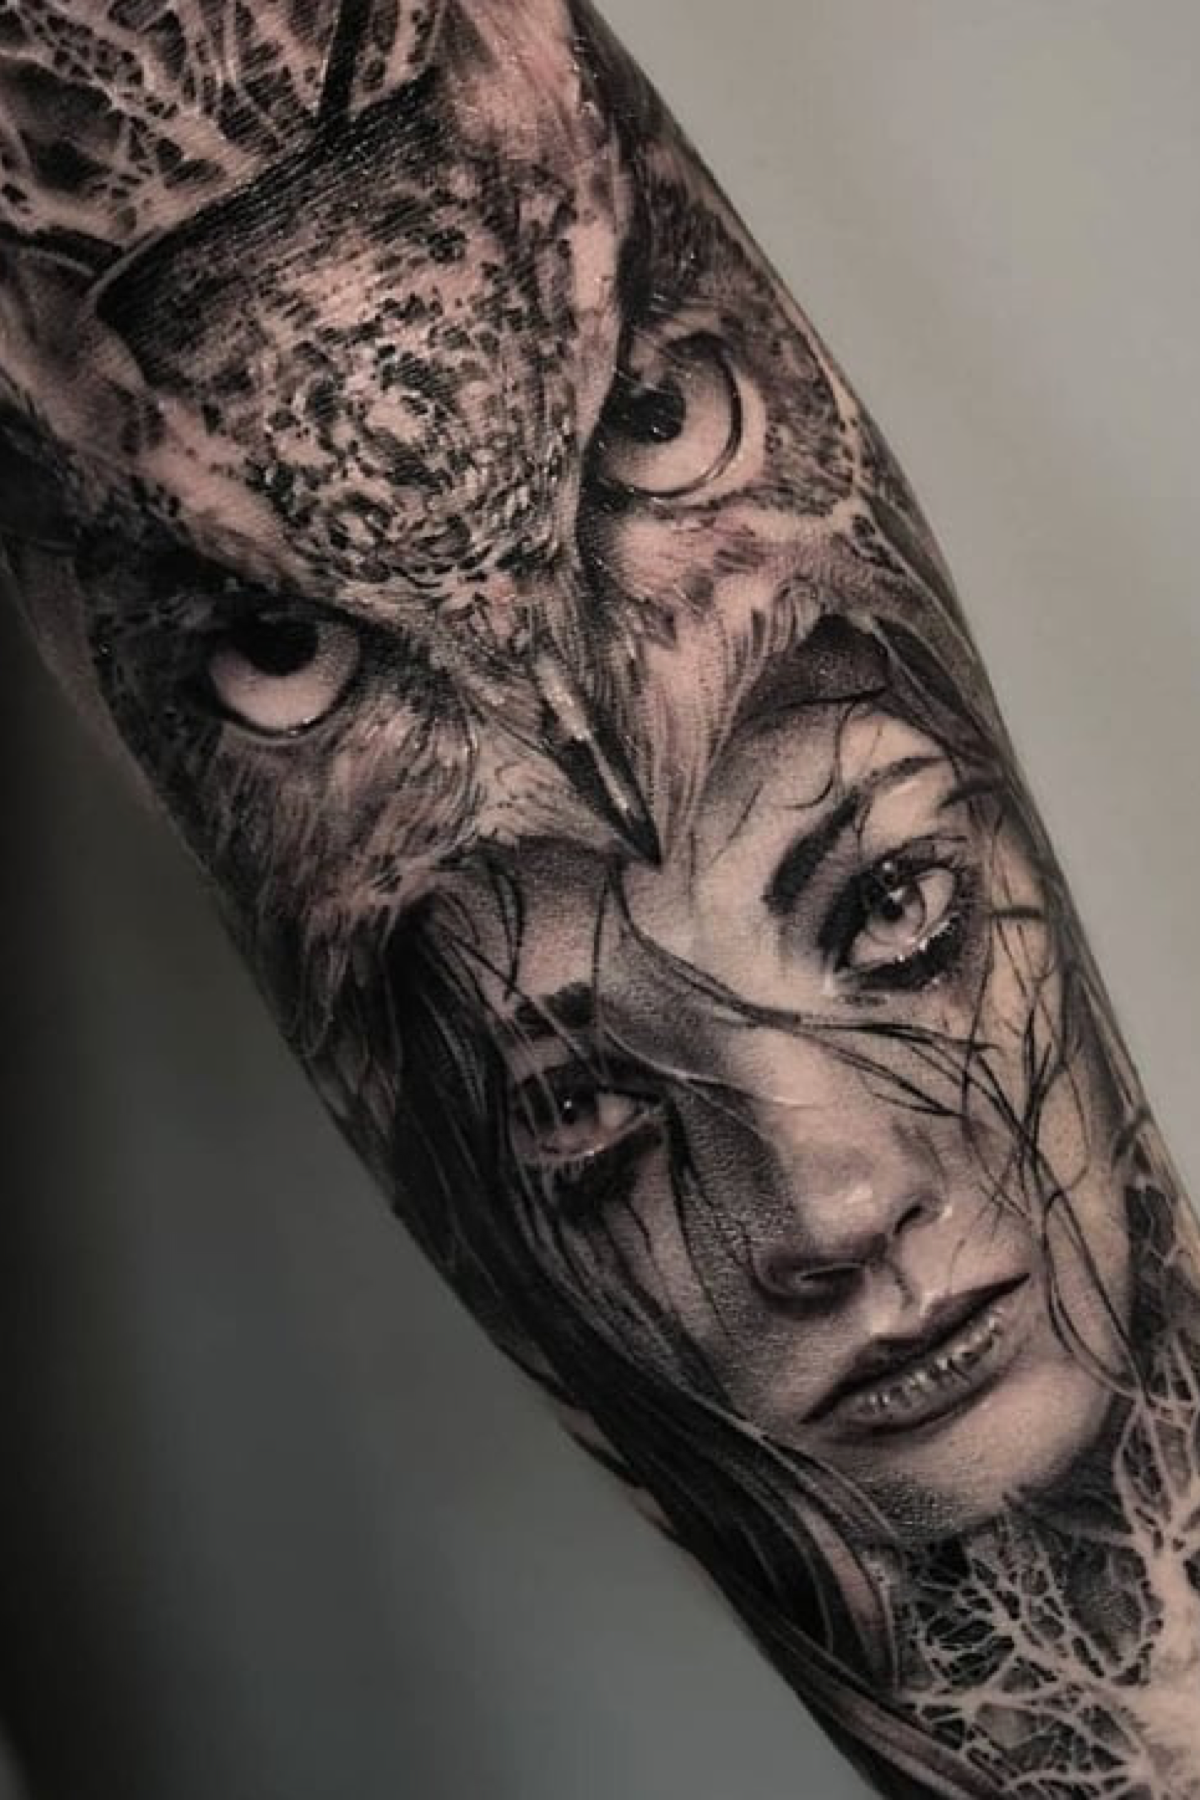 Realistic Native American Tattoo Portrait With An Owl Headdress Made By John Hudic In London Uk Headdress Tattoo Realistic Owl Tattoo Owl Tattoo Sleeve